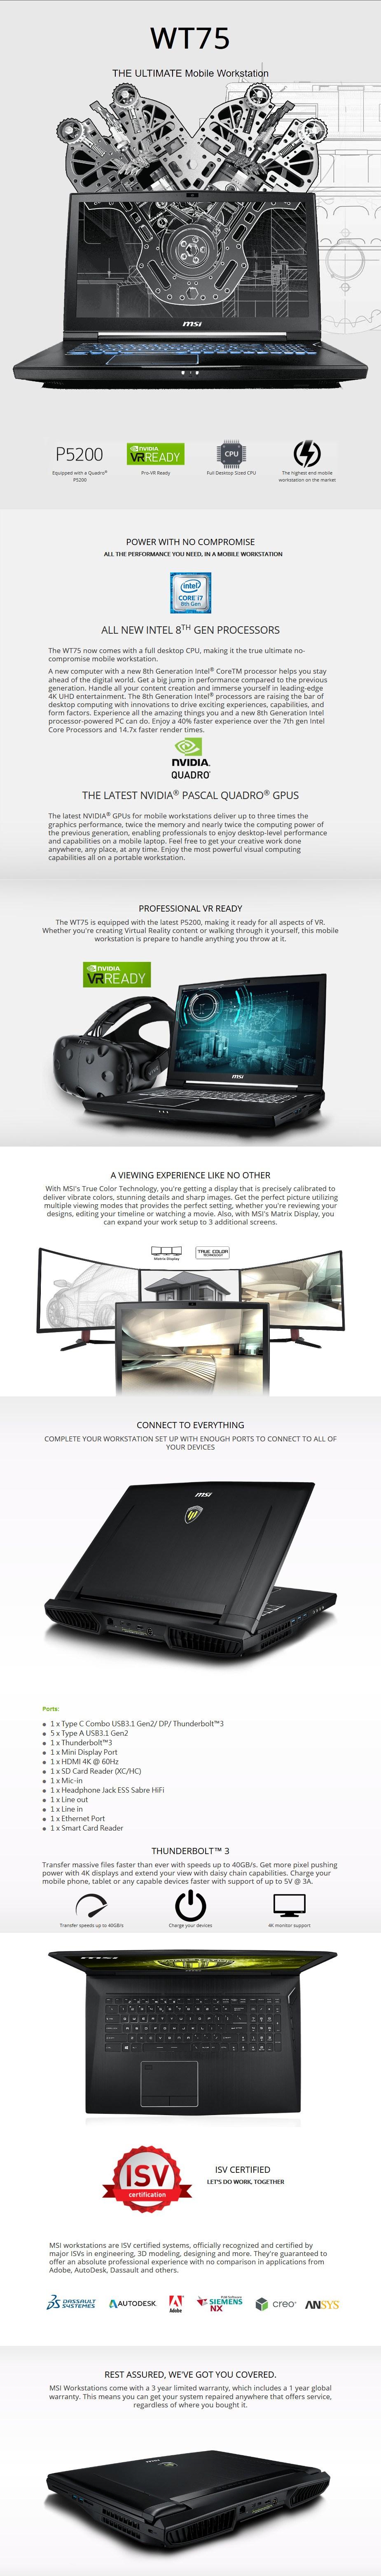 "MSI WT75 8SM 17.3"" 4K Workstation Notebook Xeon 32GB 512GB+1TB Quadro P5200 W10P - Desktop Overview 1"